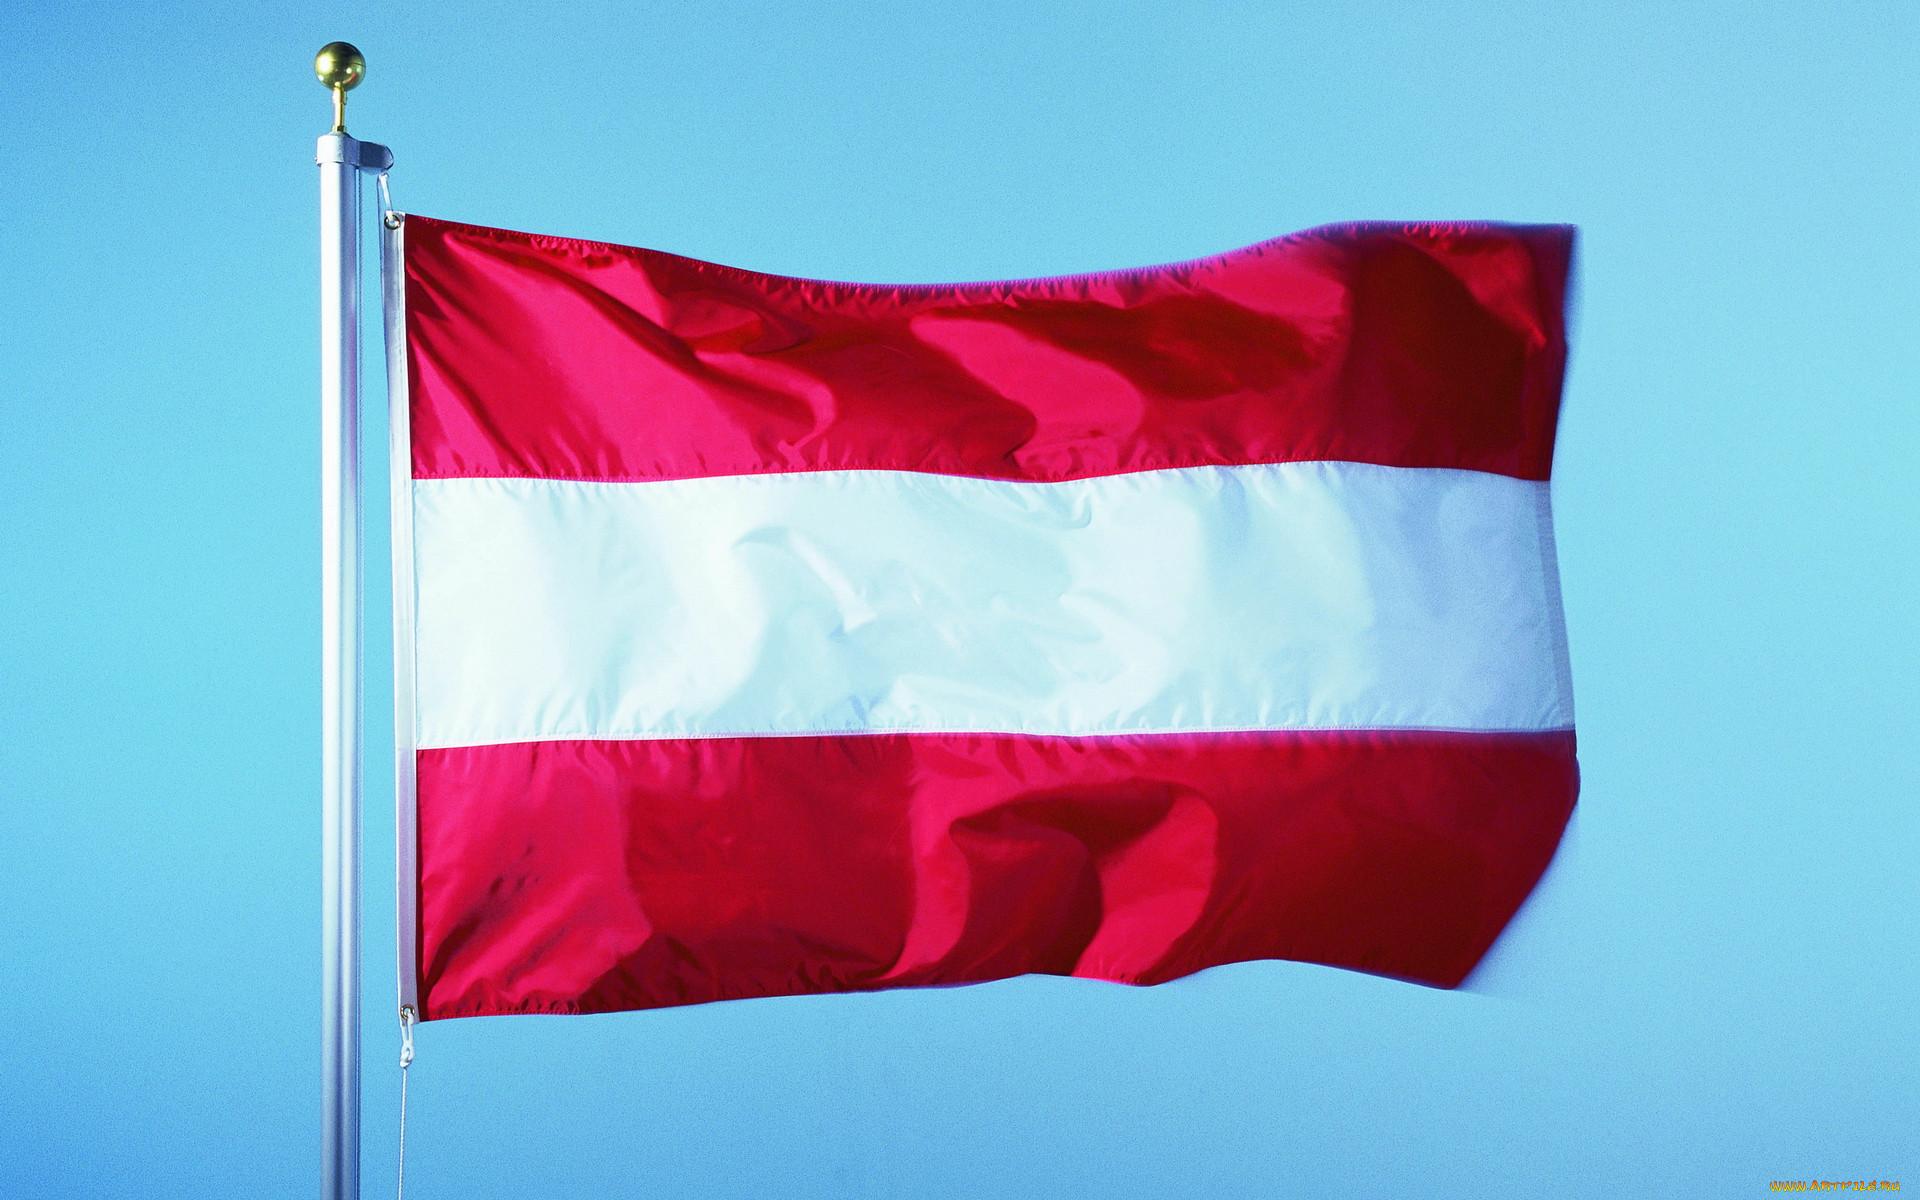 развиваться флаг и герб фото австрийский медведь заебавший всех